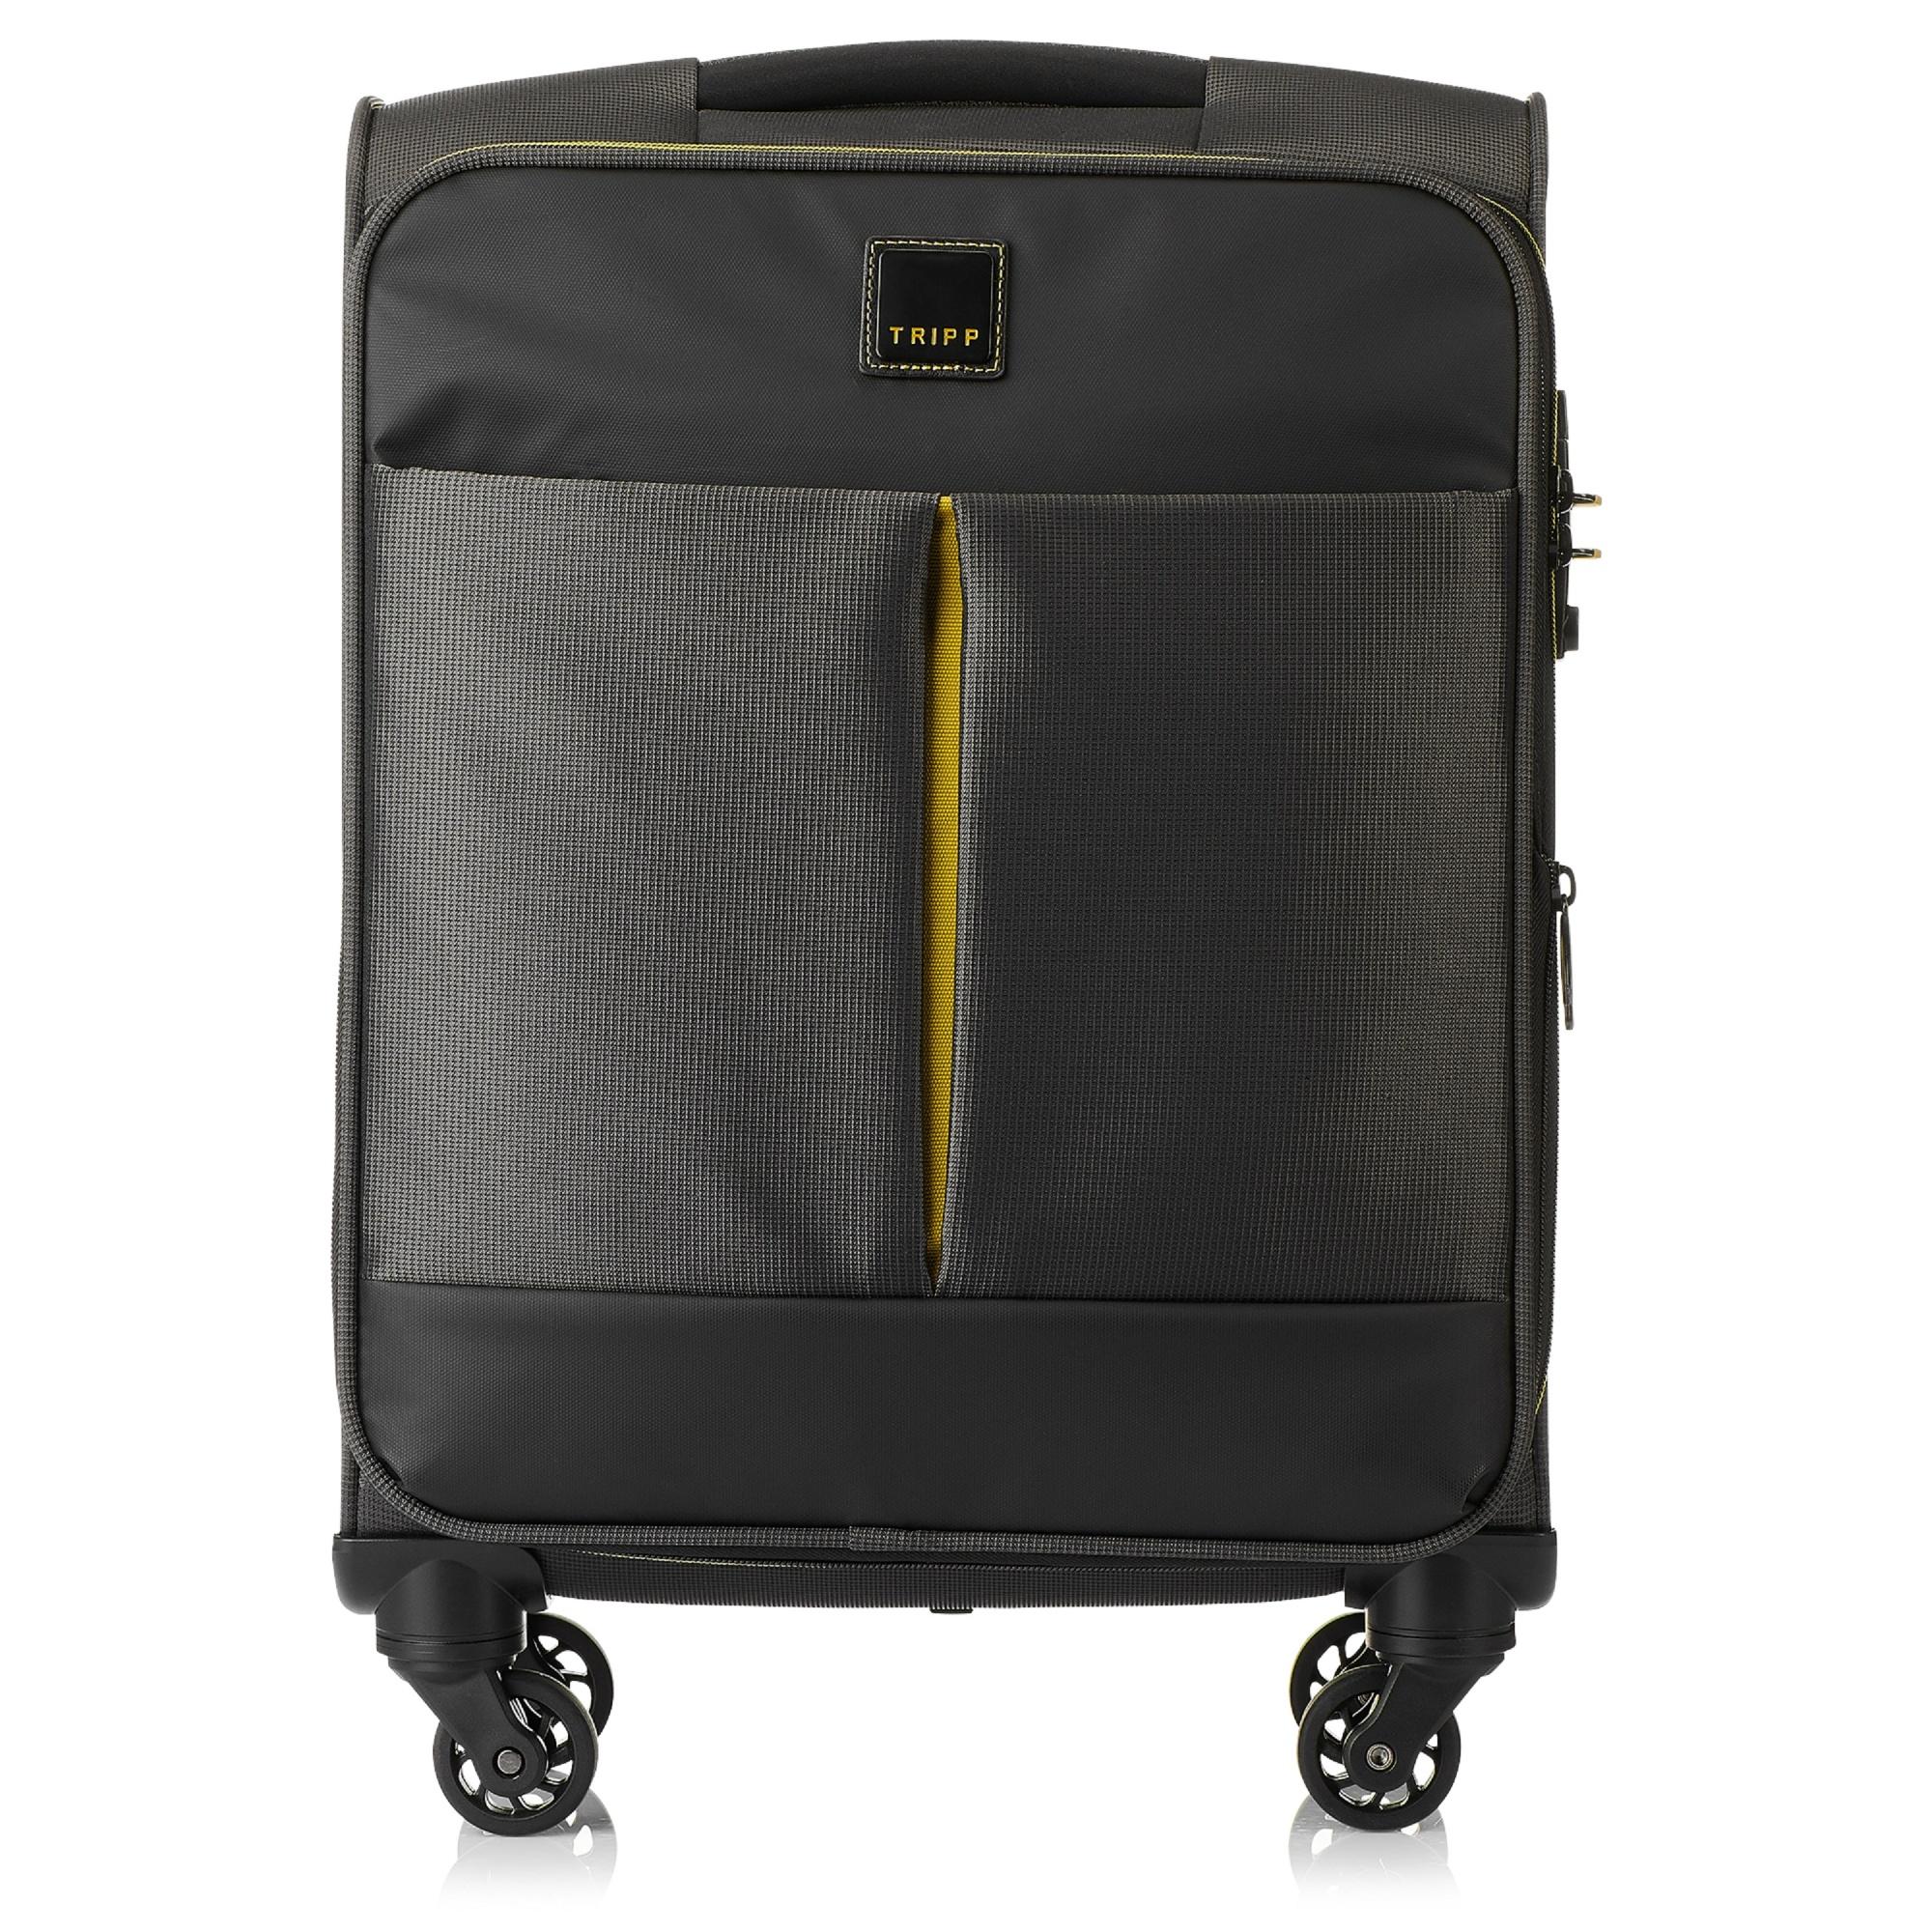 1ac7439c149 Tripp Graphite 'Style Lite' Cabin 4 Wheel Exp Suitcase - Soft Suitcases    Tripp Ireland